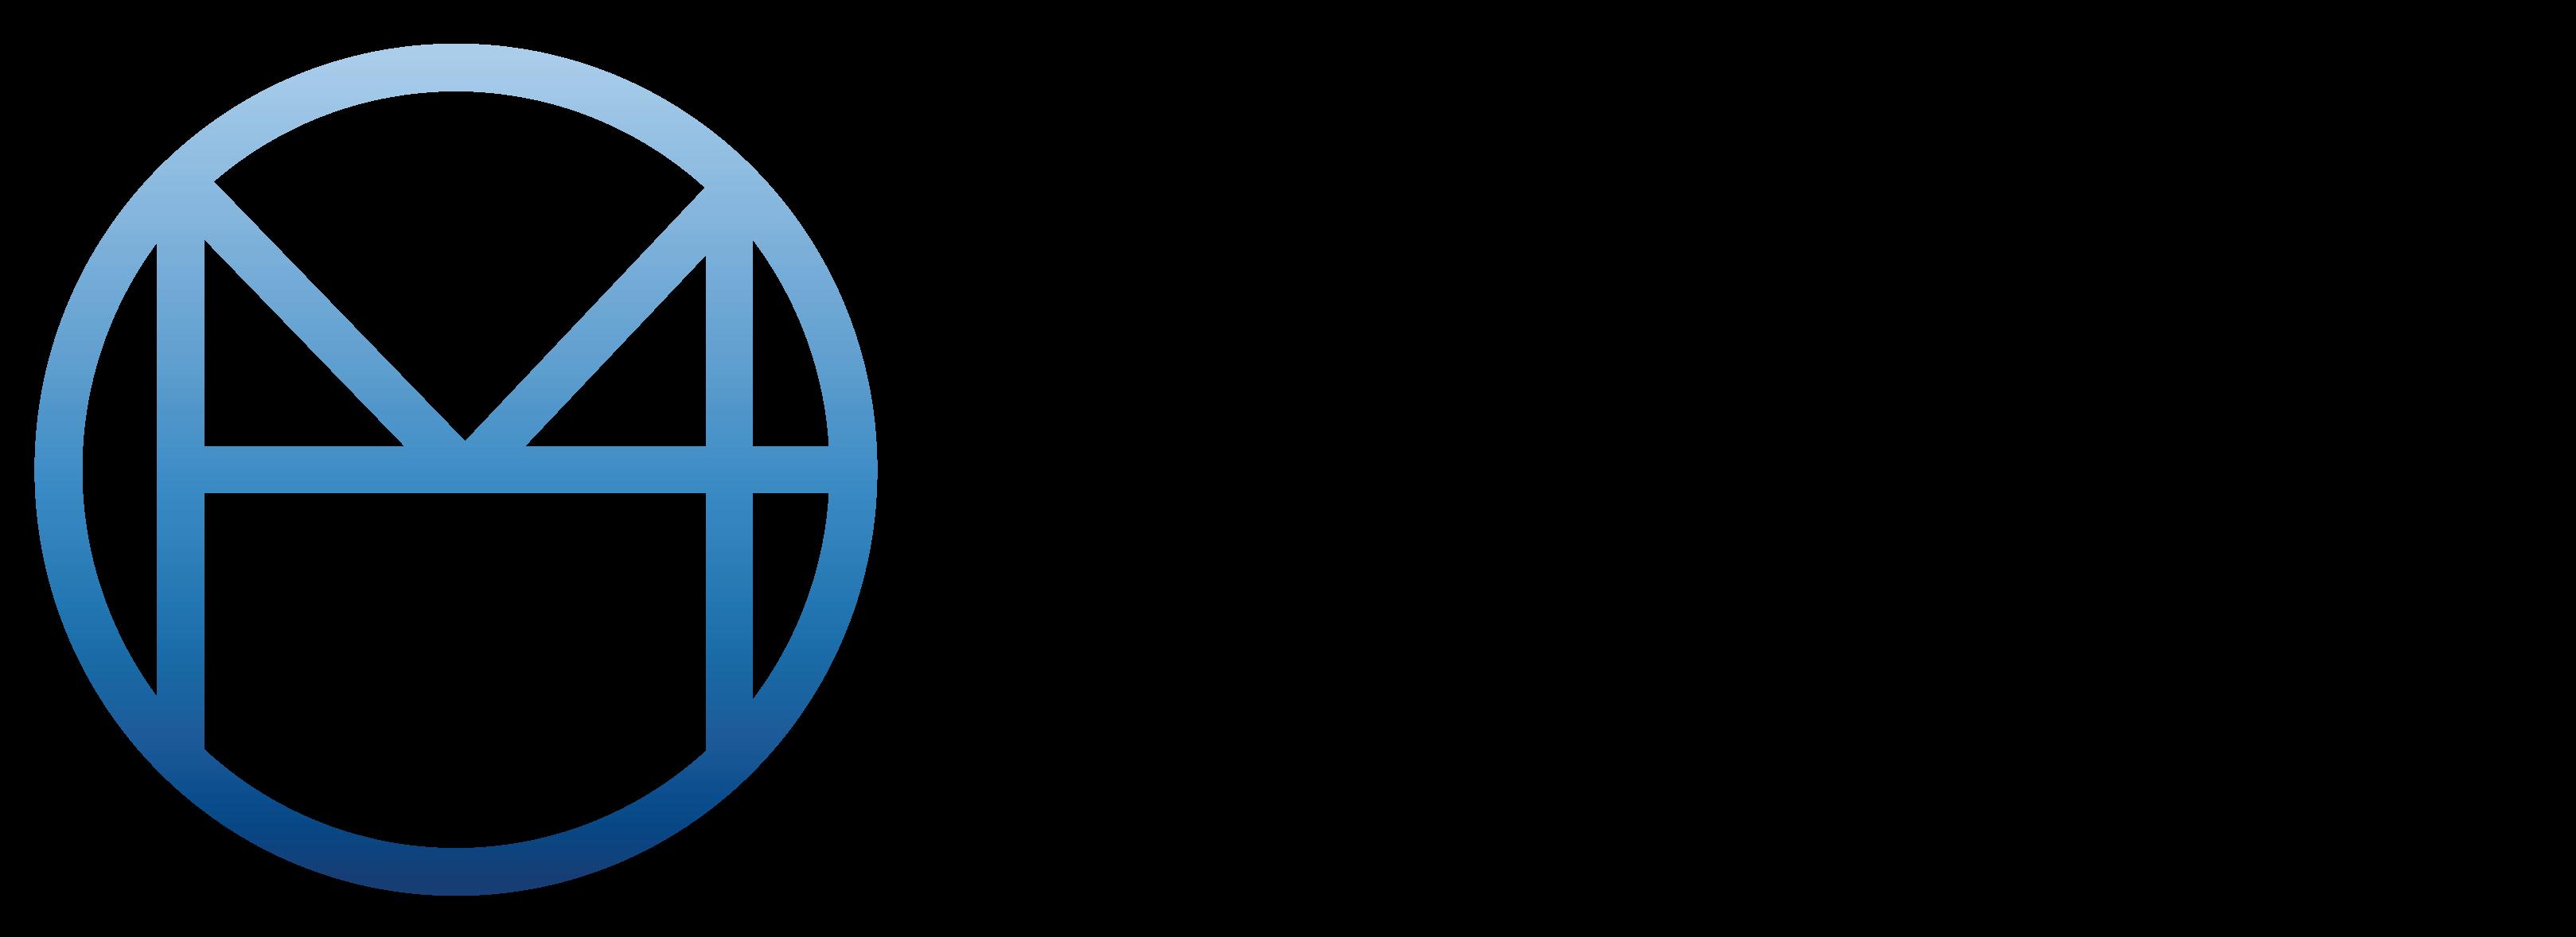 logo-mgh-final2-2